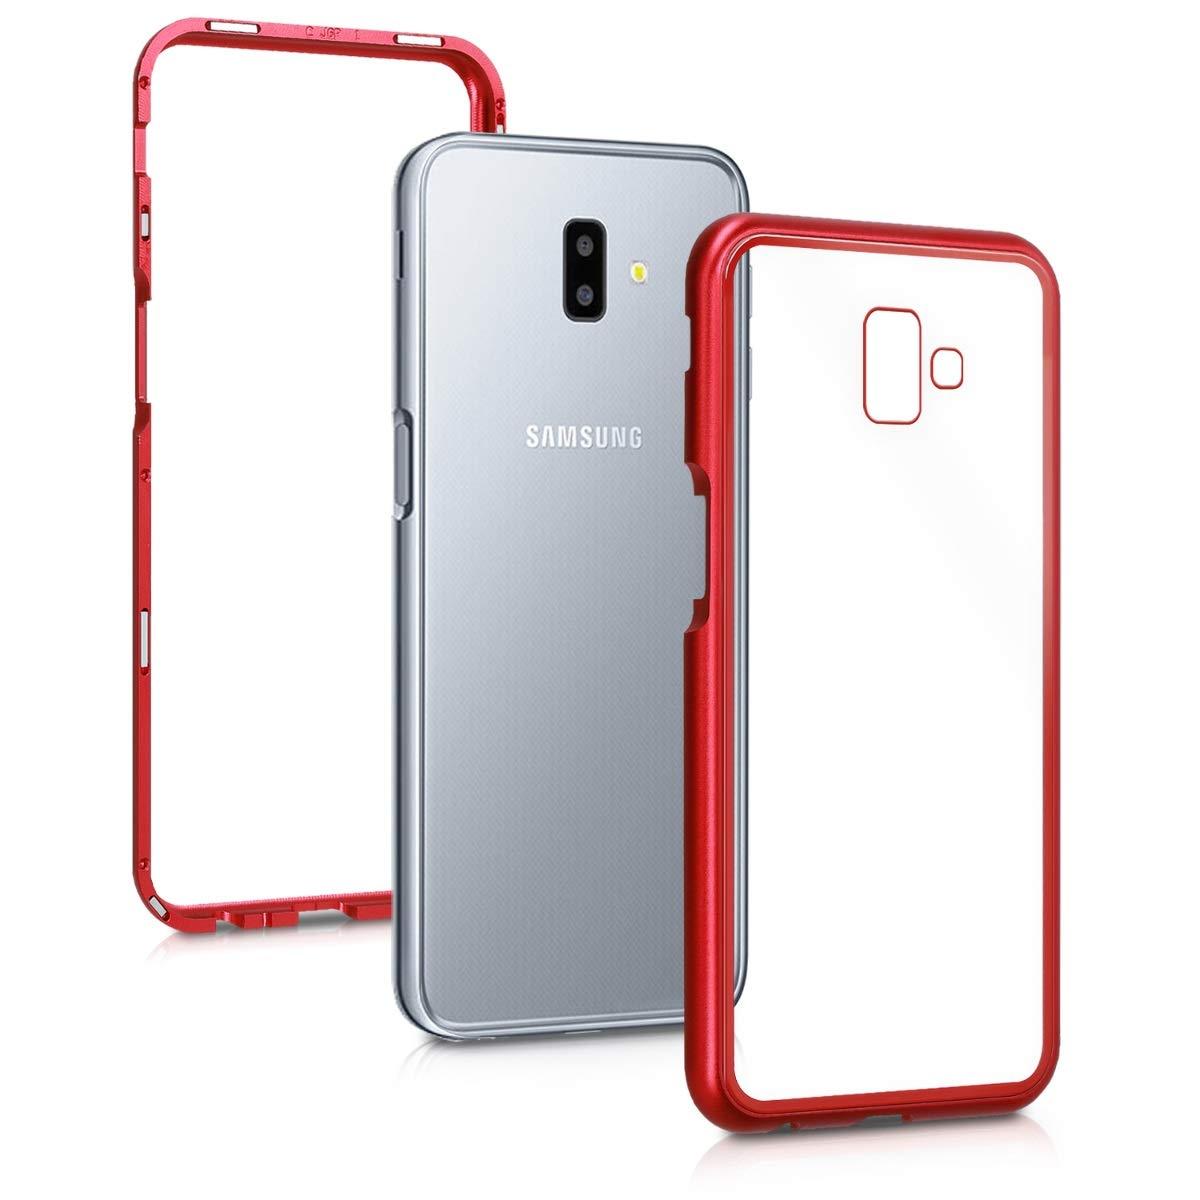 Kalibri Θήκη Full Body Samsung Galaxy J6+ / J6 Plus DUOS - Red / Transparent (47611.09)